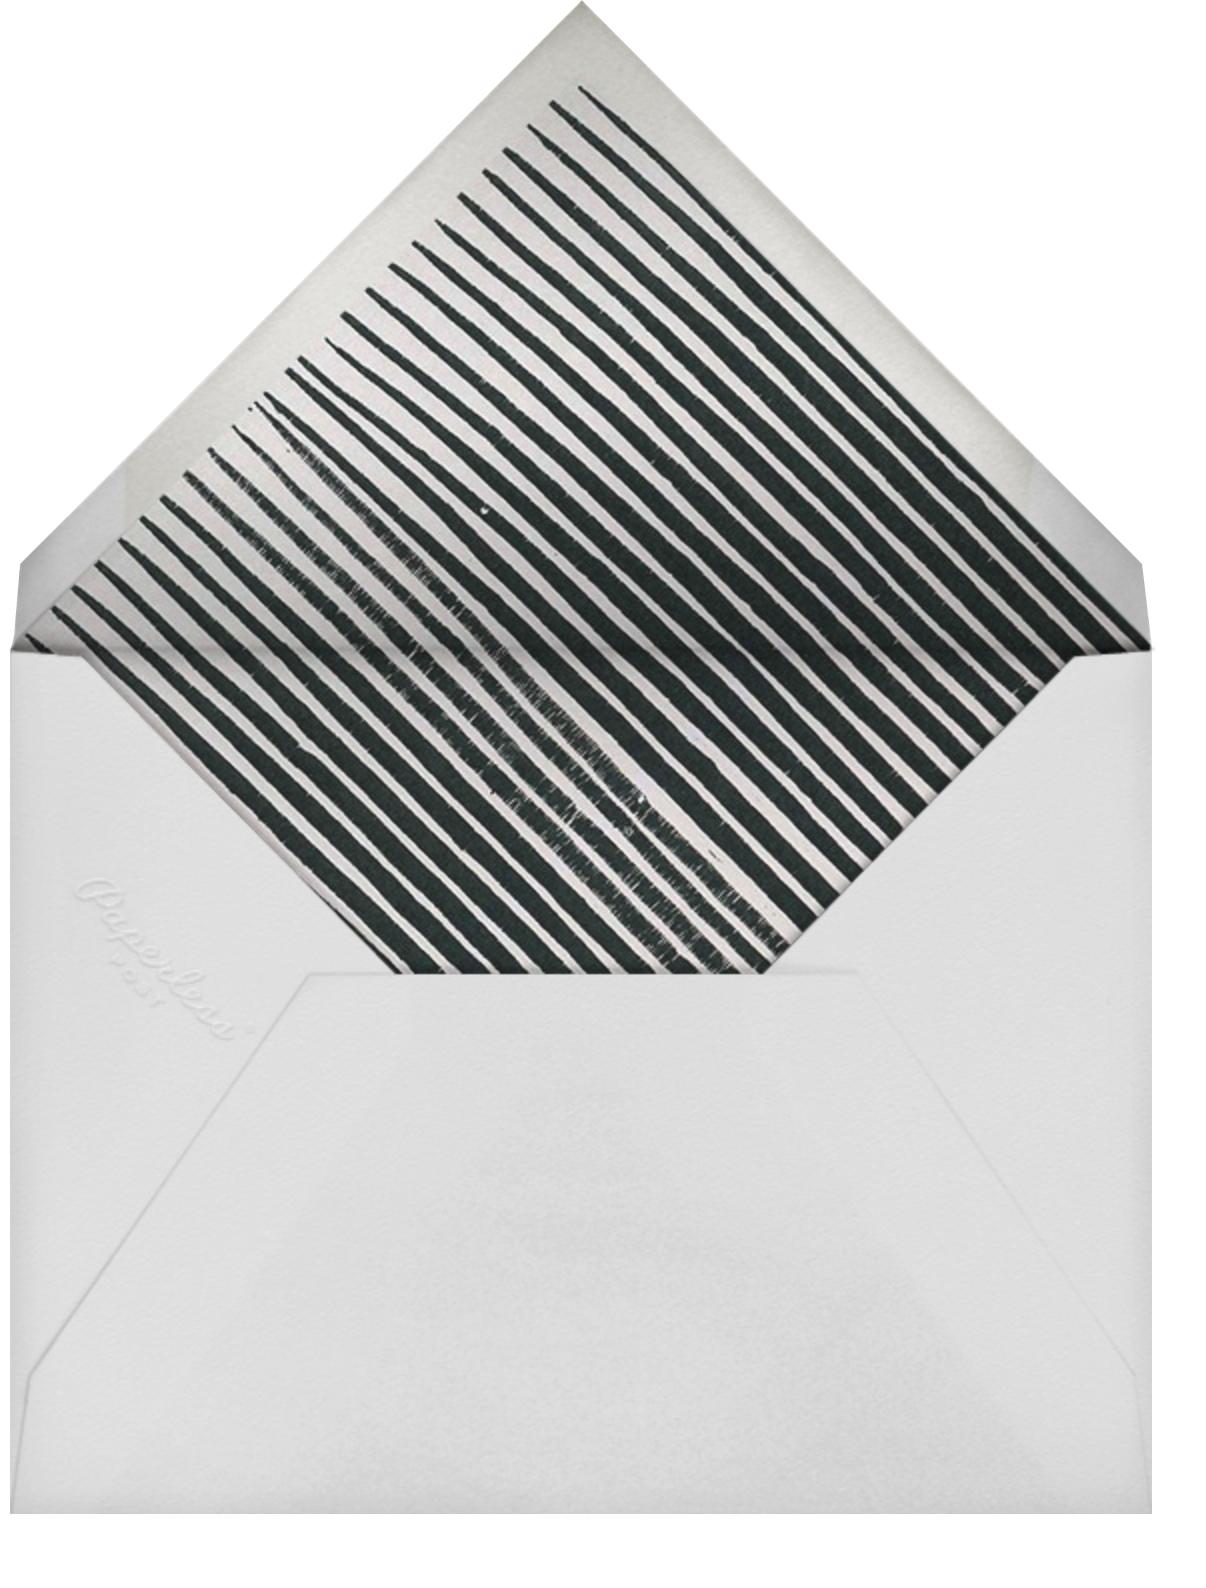 Fette - Gold/White - Kelly Wearstler - Bat and bar mitzvah - envelope back